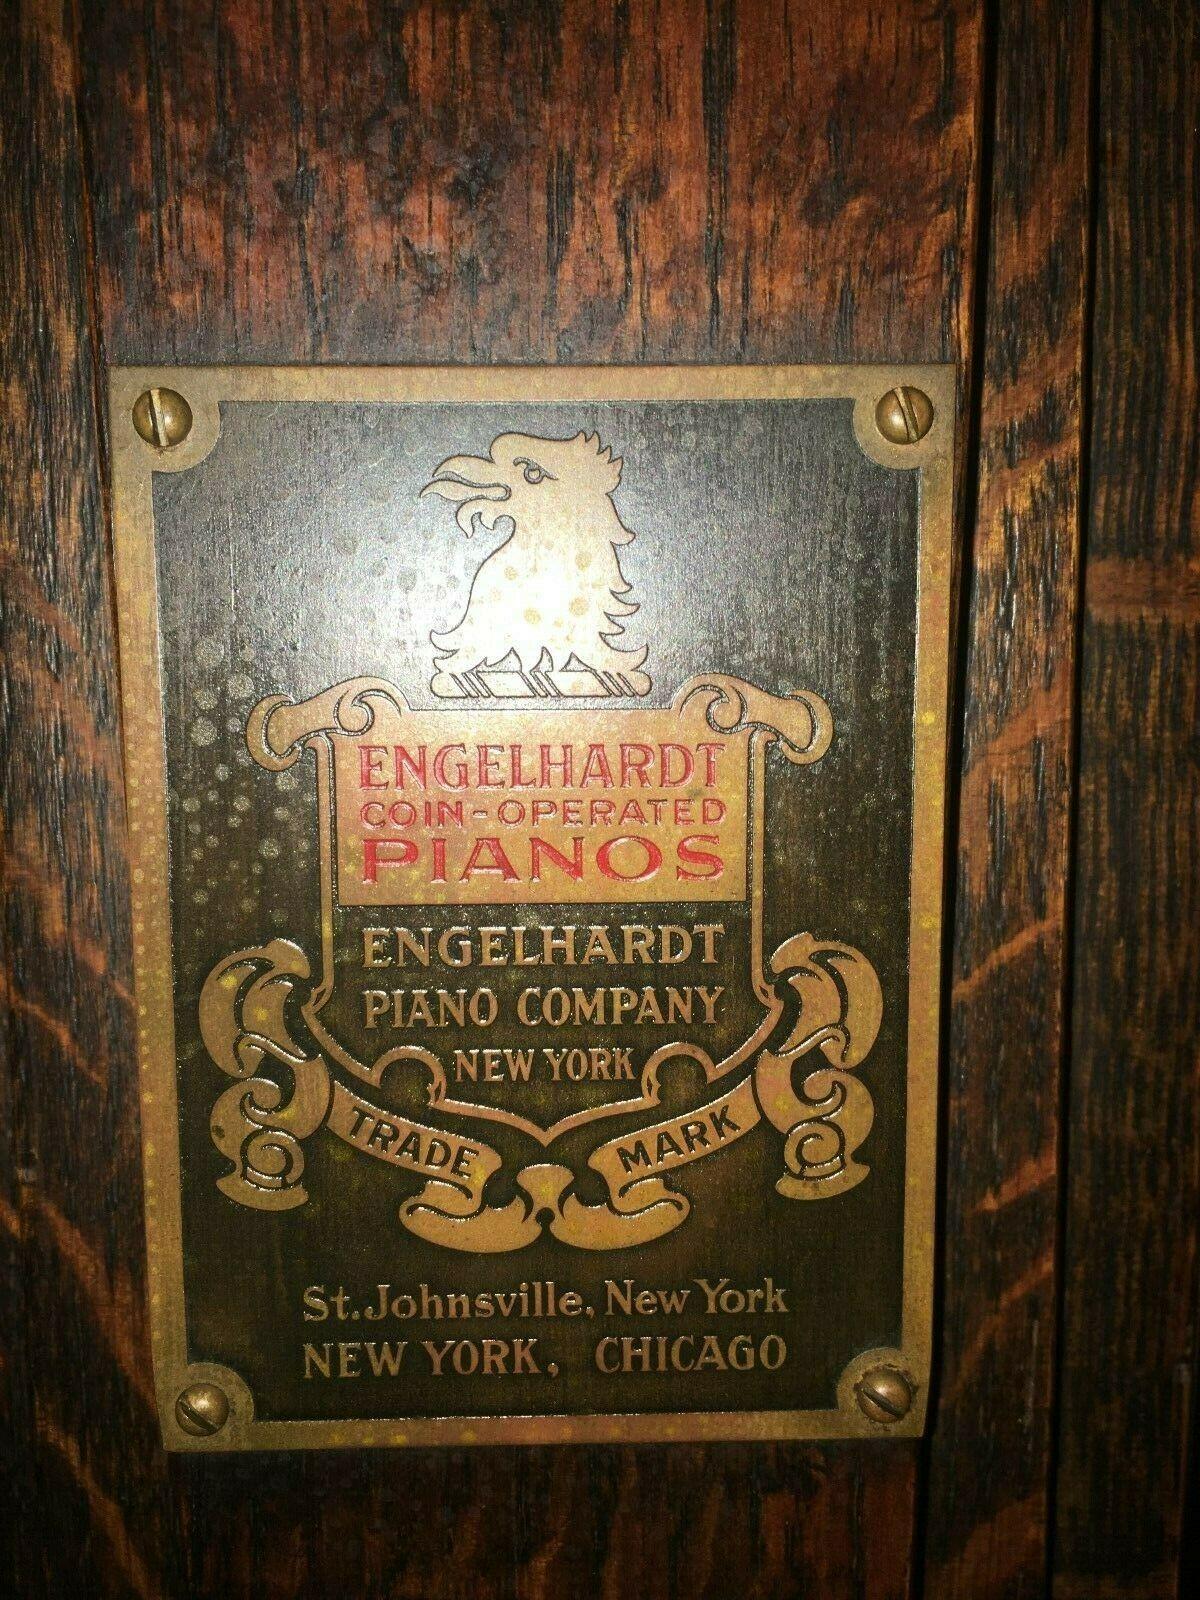 Niagara-Engelhardt-Player-Piano-2.jpg